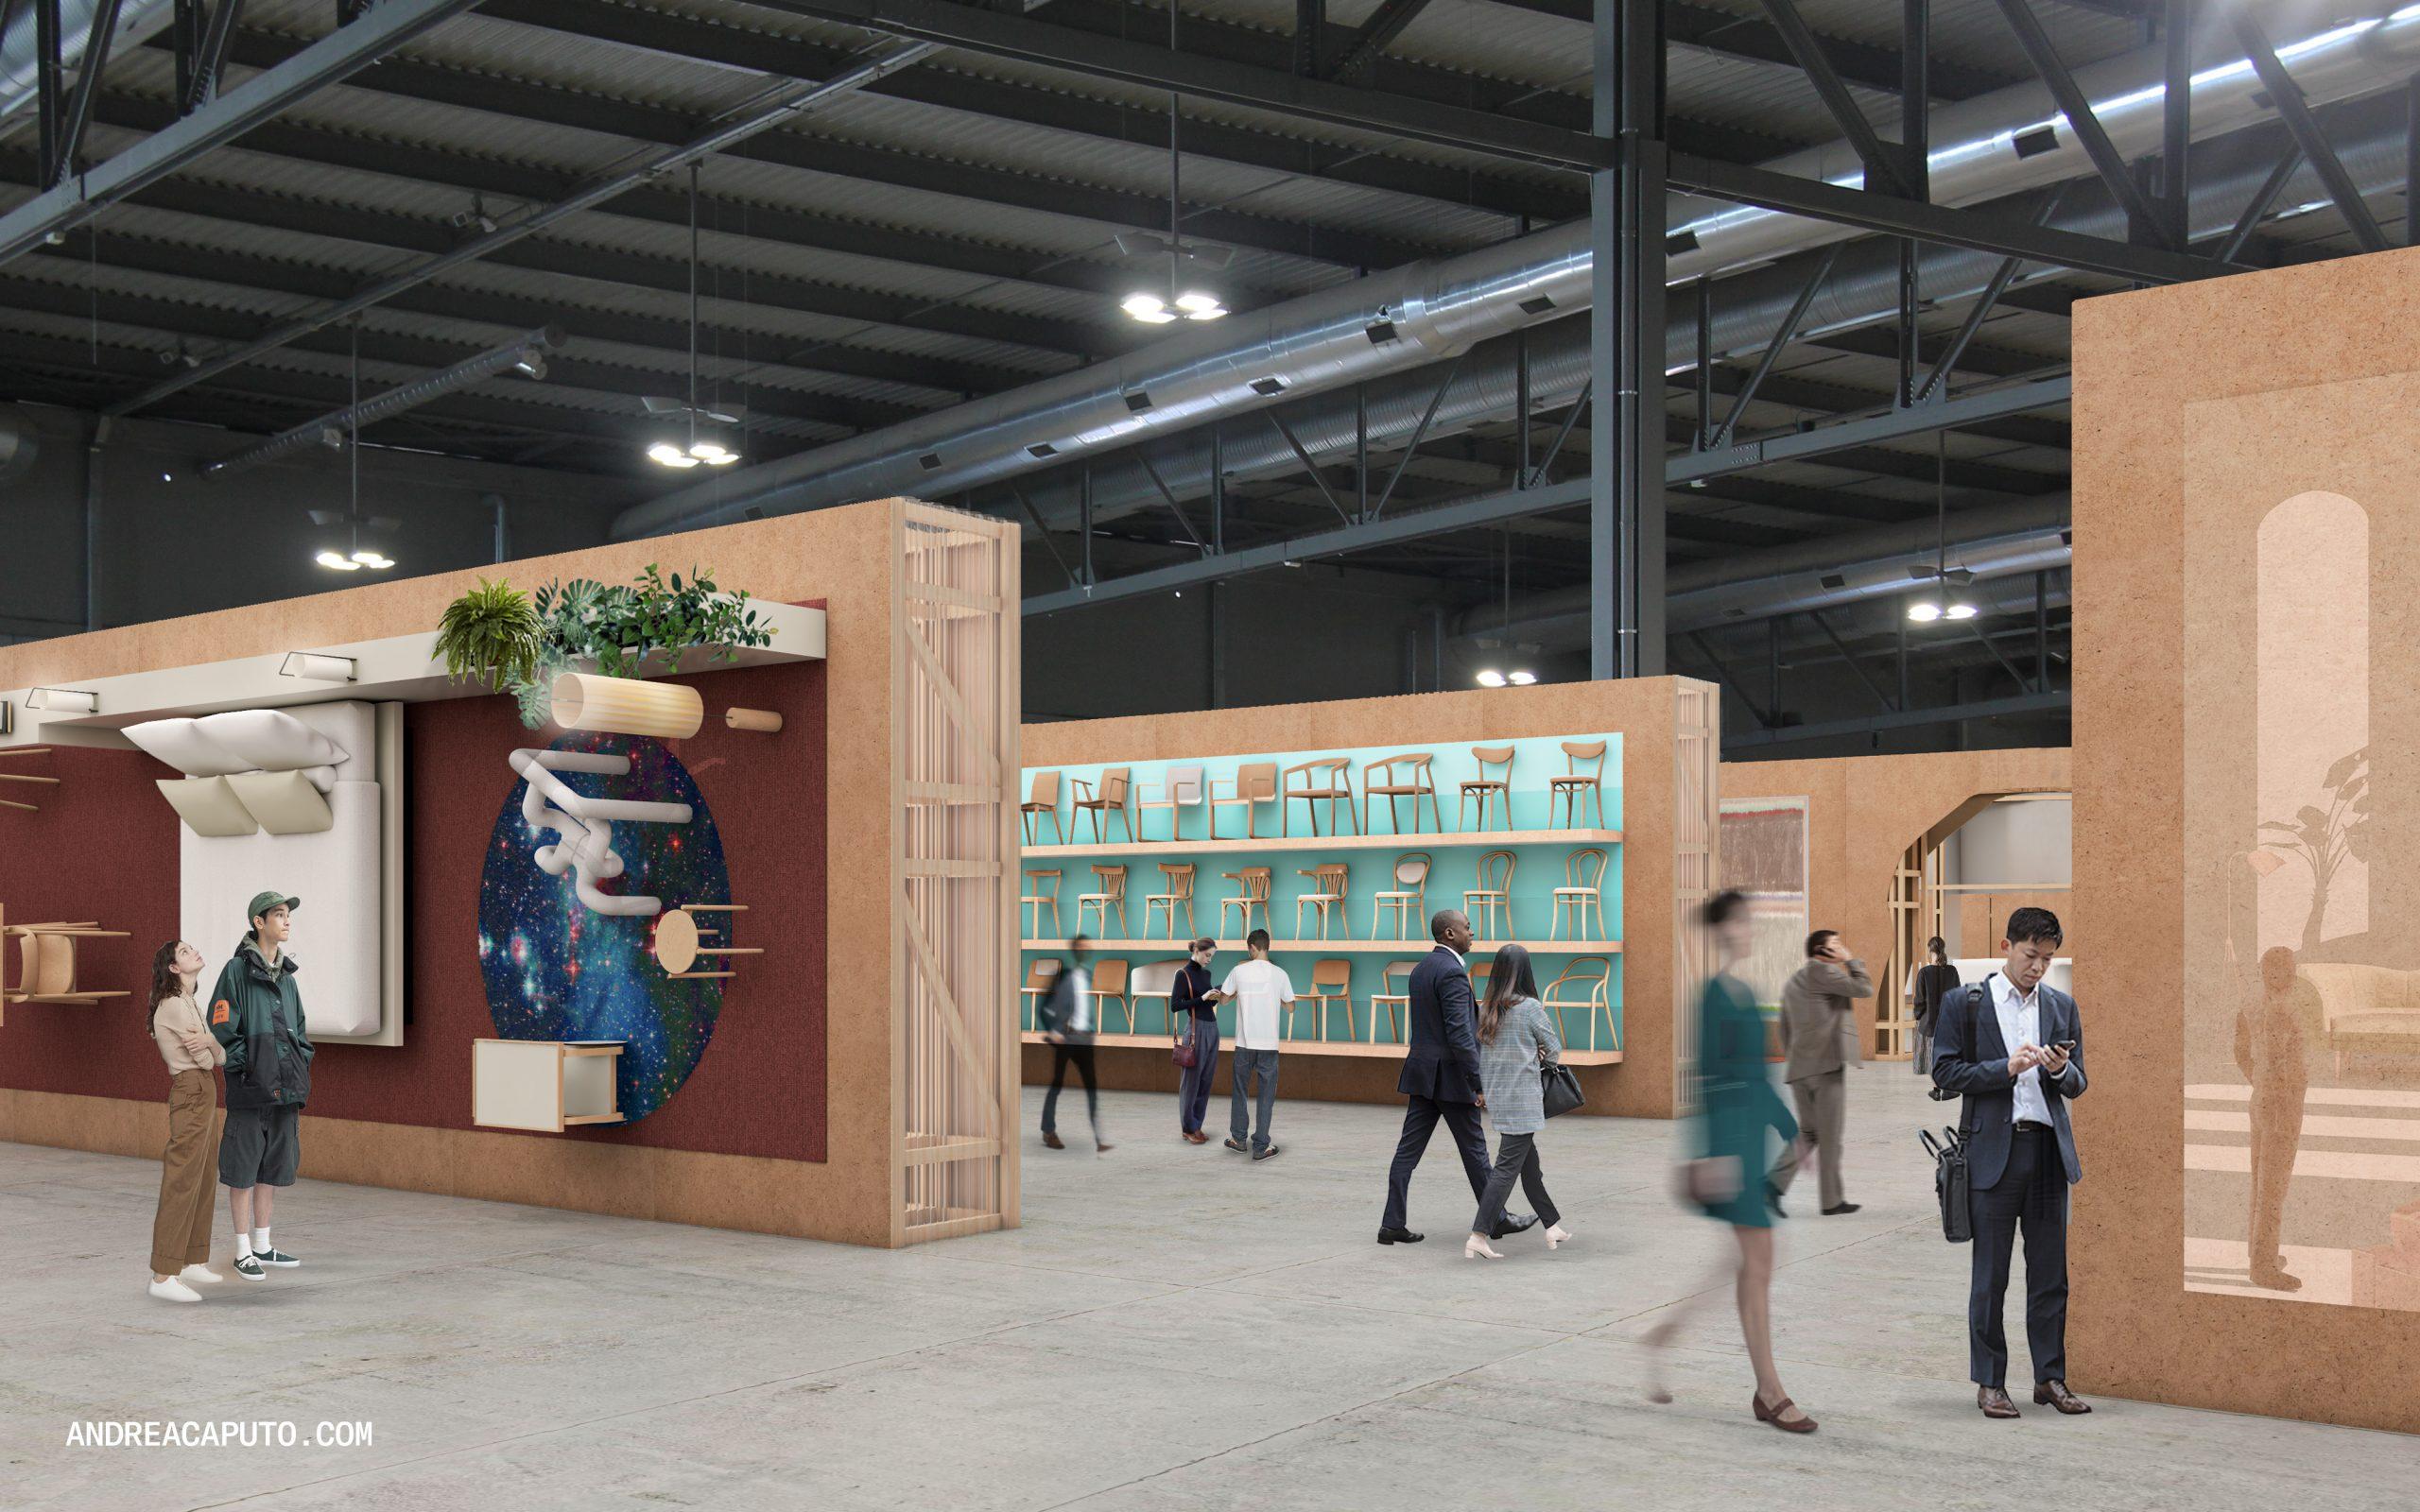 Salone del Mobile.Milano 2021 <br>ミラノサローネ2021 特別展 <br>「supersalone (スーパーサローネ)」